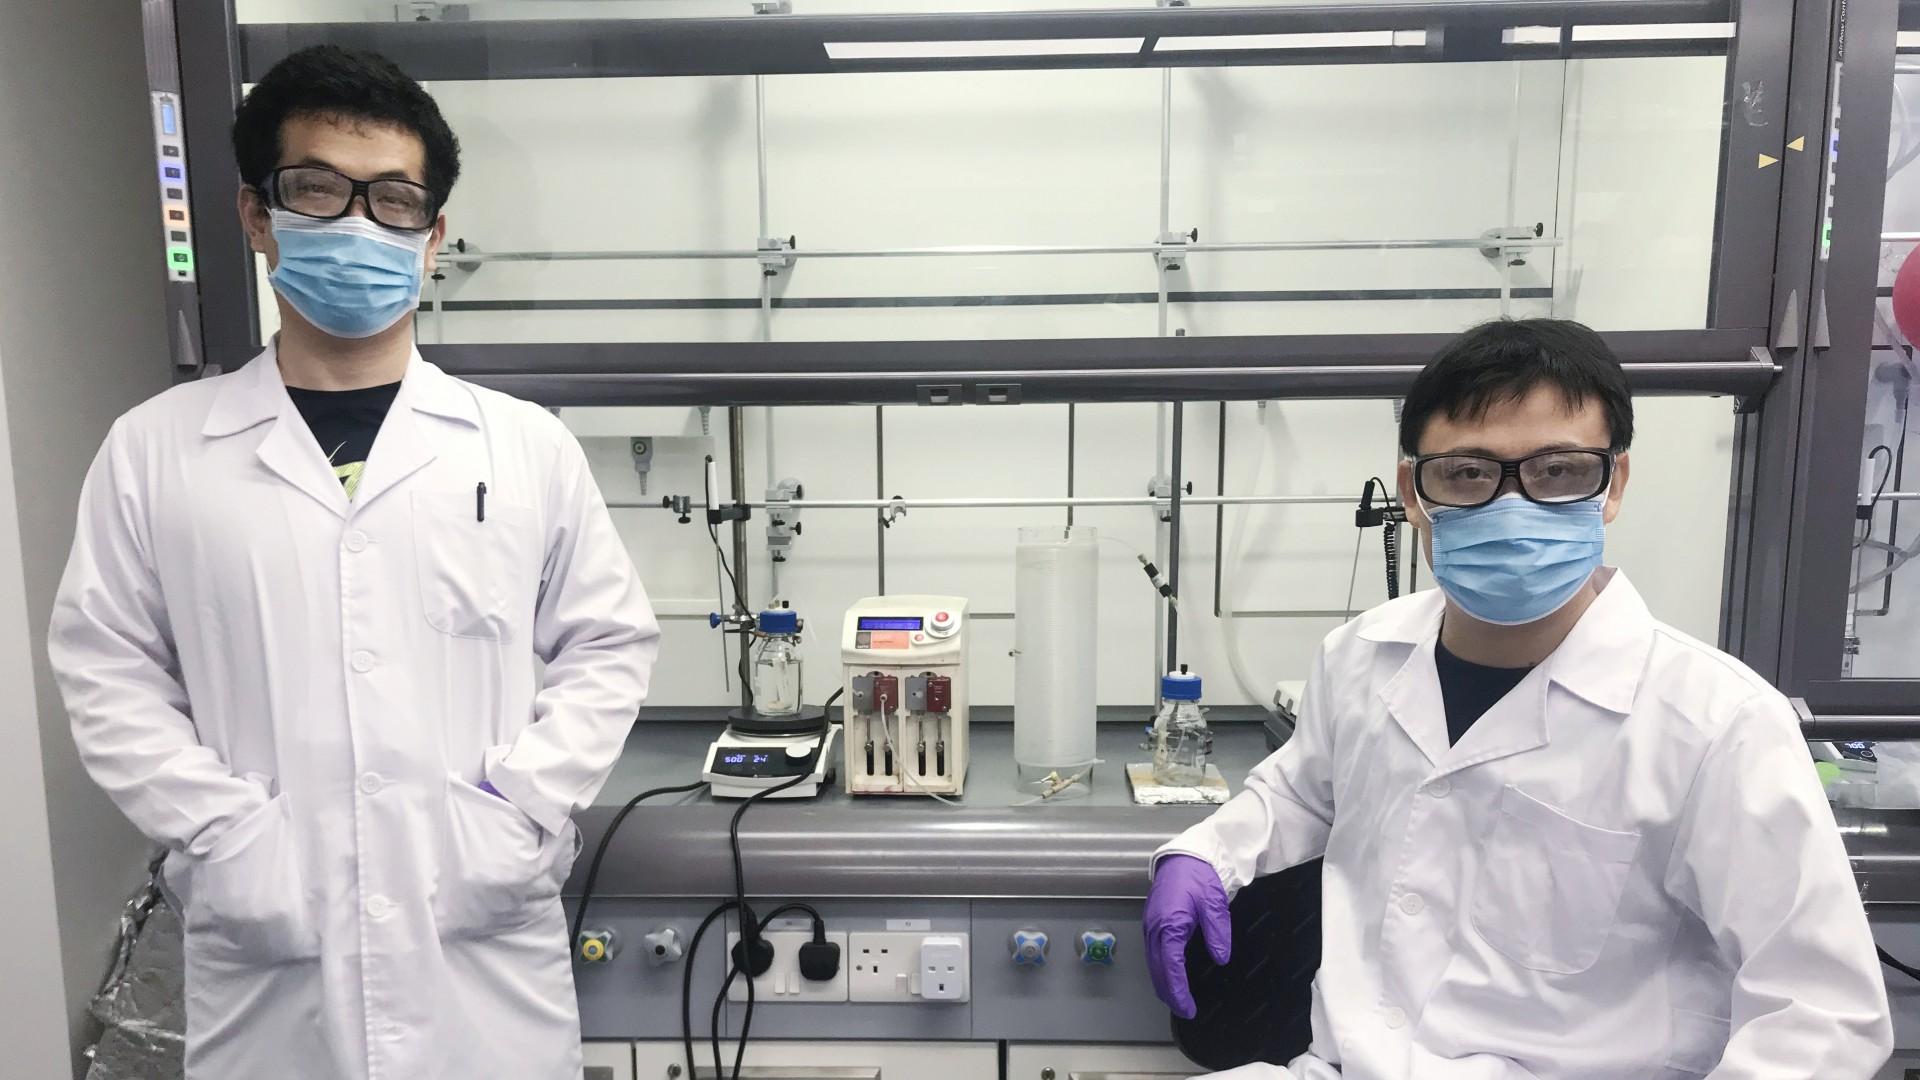 2021 0601 NUS researchers develop novel technique to automate production of pharmaceutical compounds